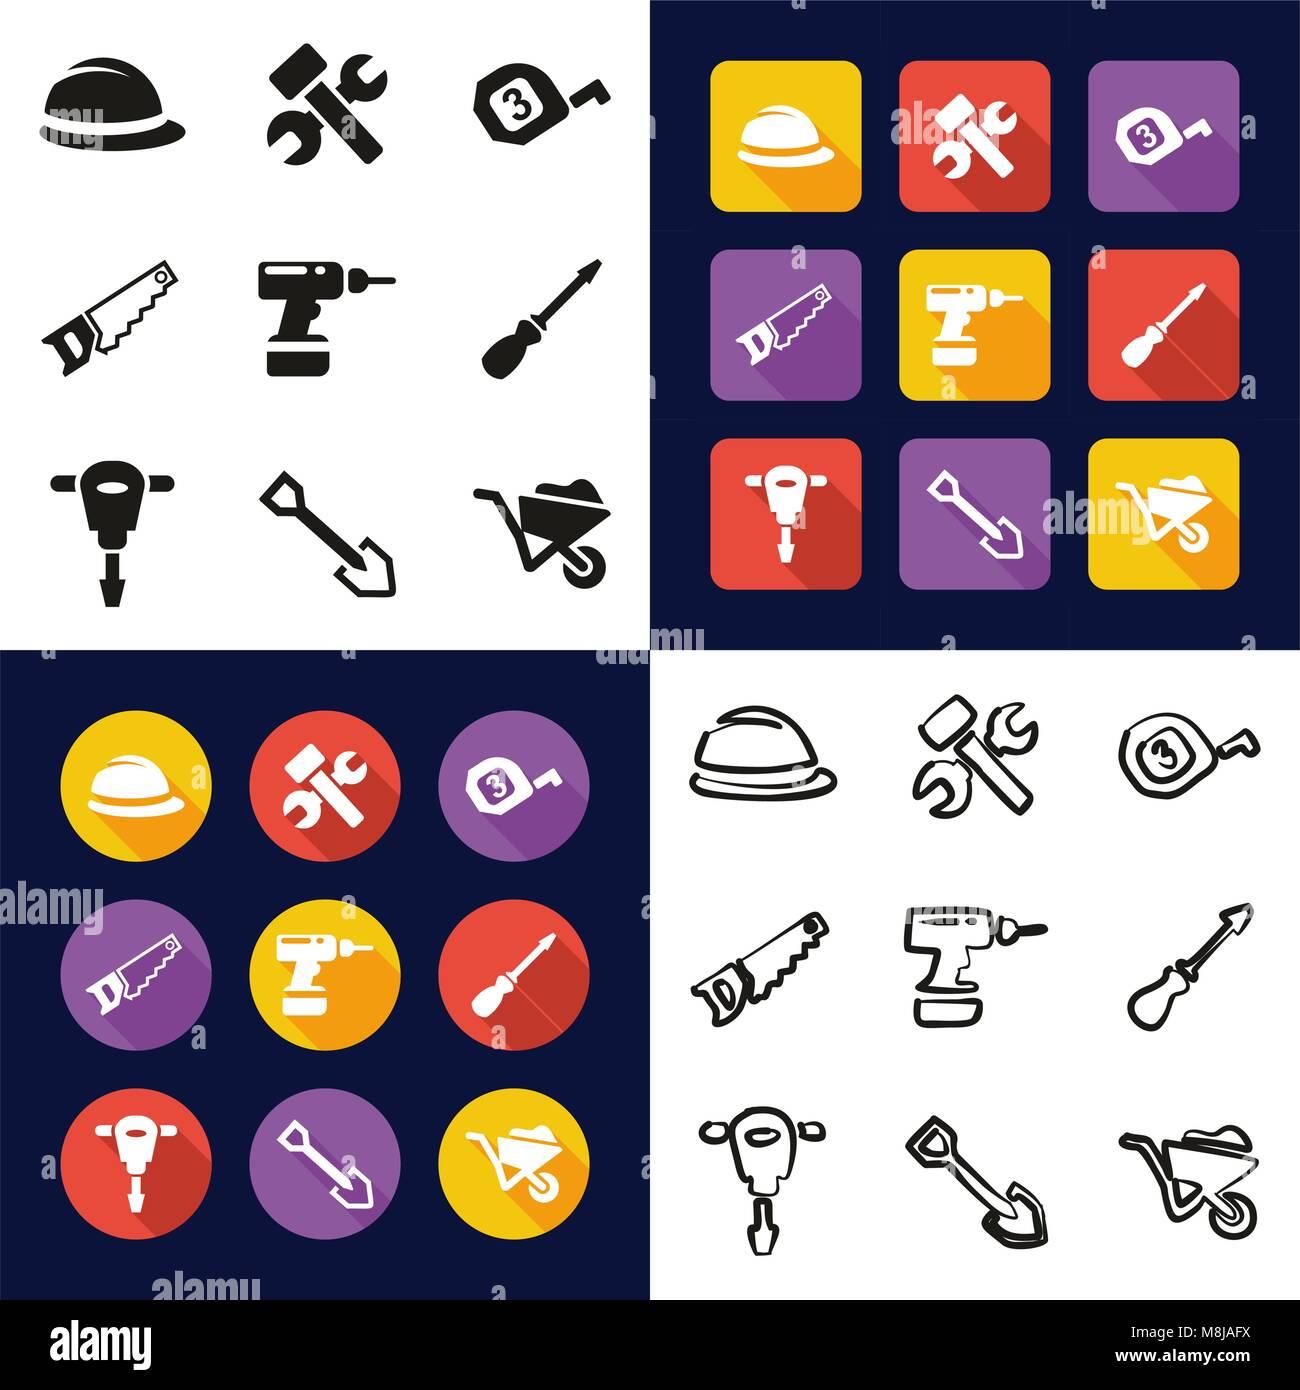 Icon Saw Hammer Symbol Equipment Stock Photos Icon Saw Hammer